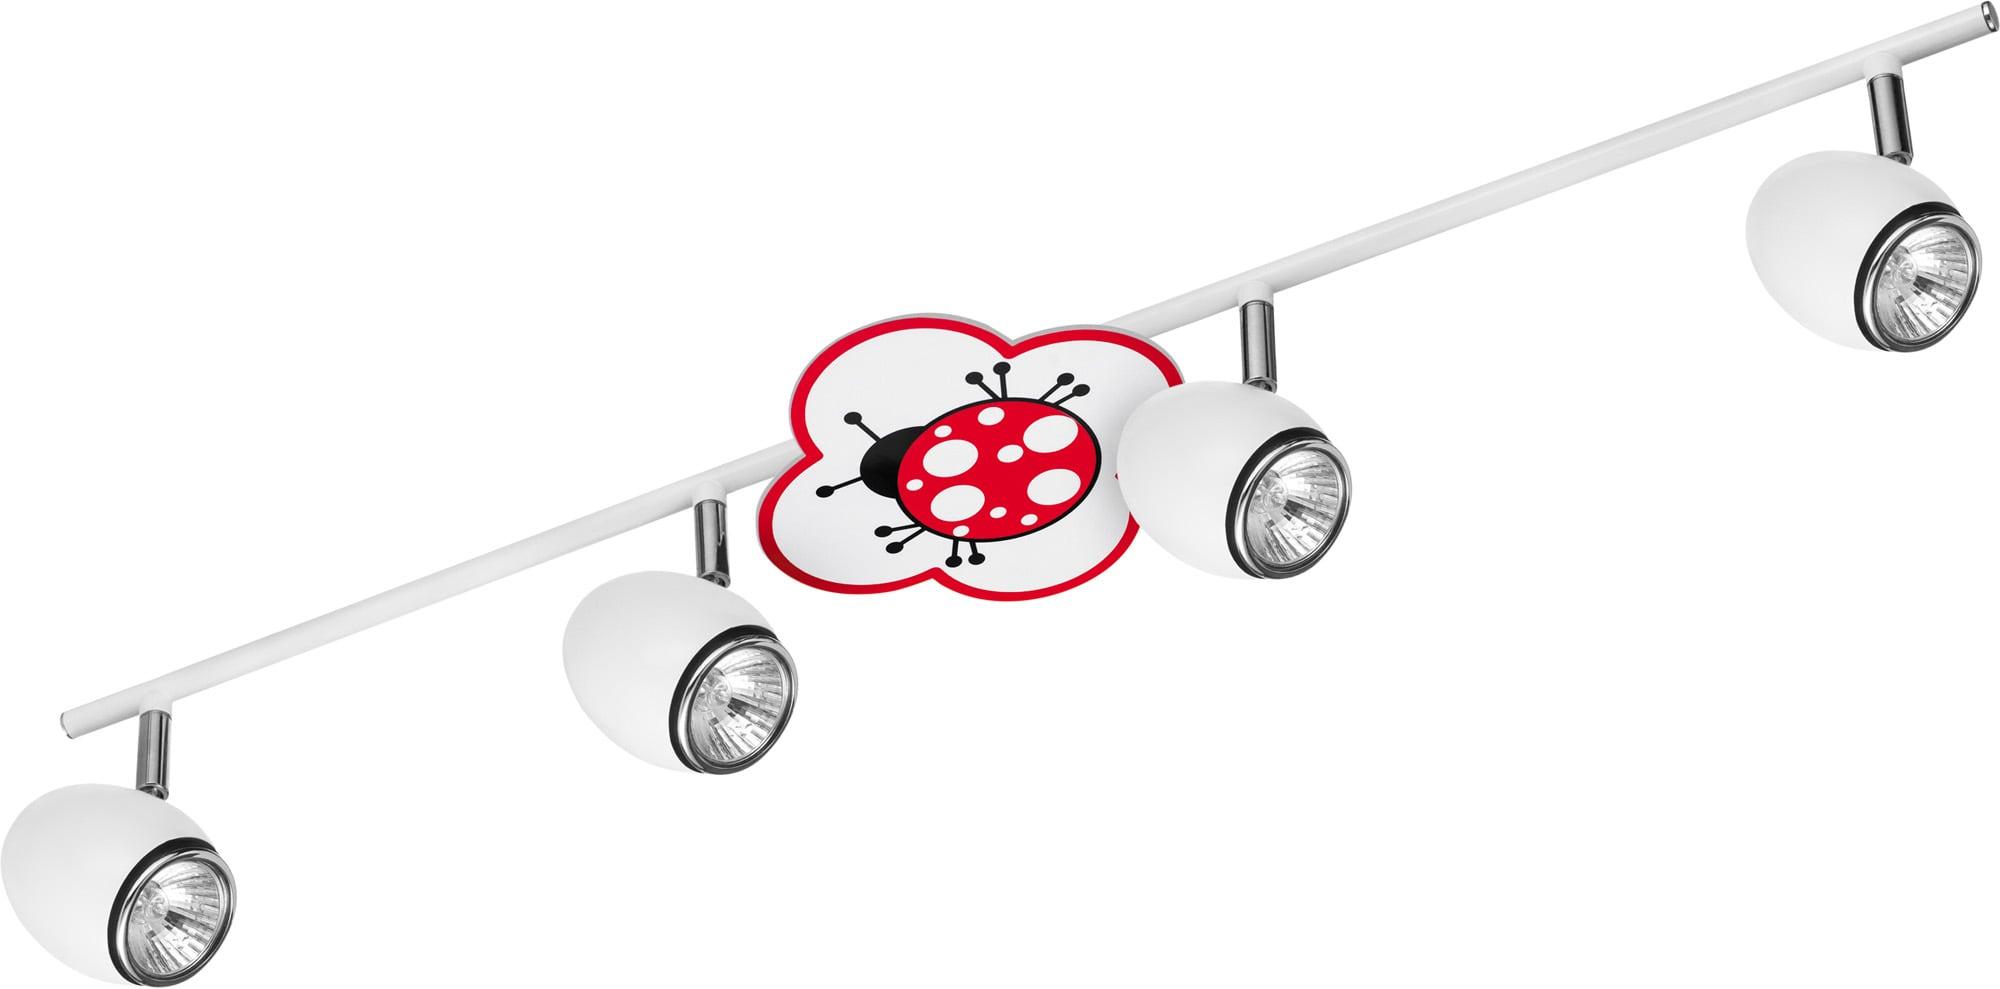 Lamp for a child Biedronka - Fly white / chrome 4x50W GU10